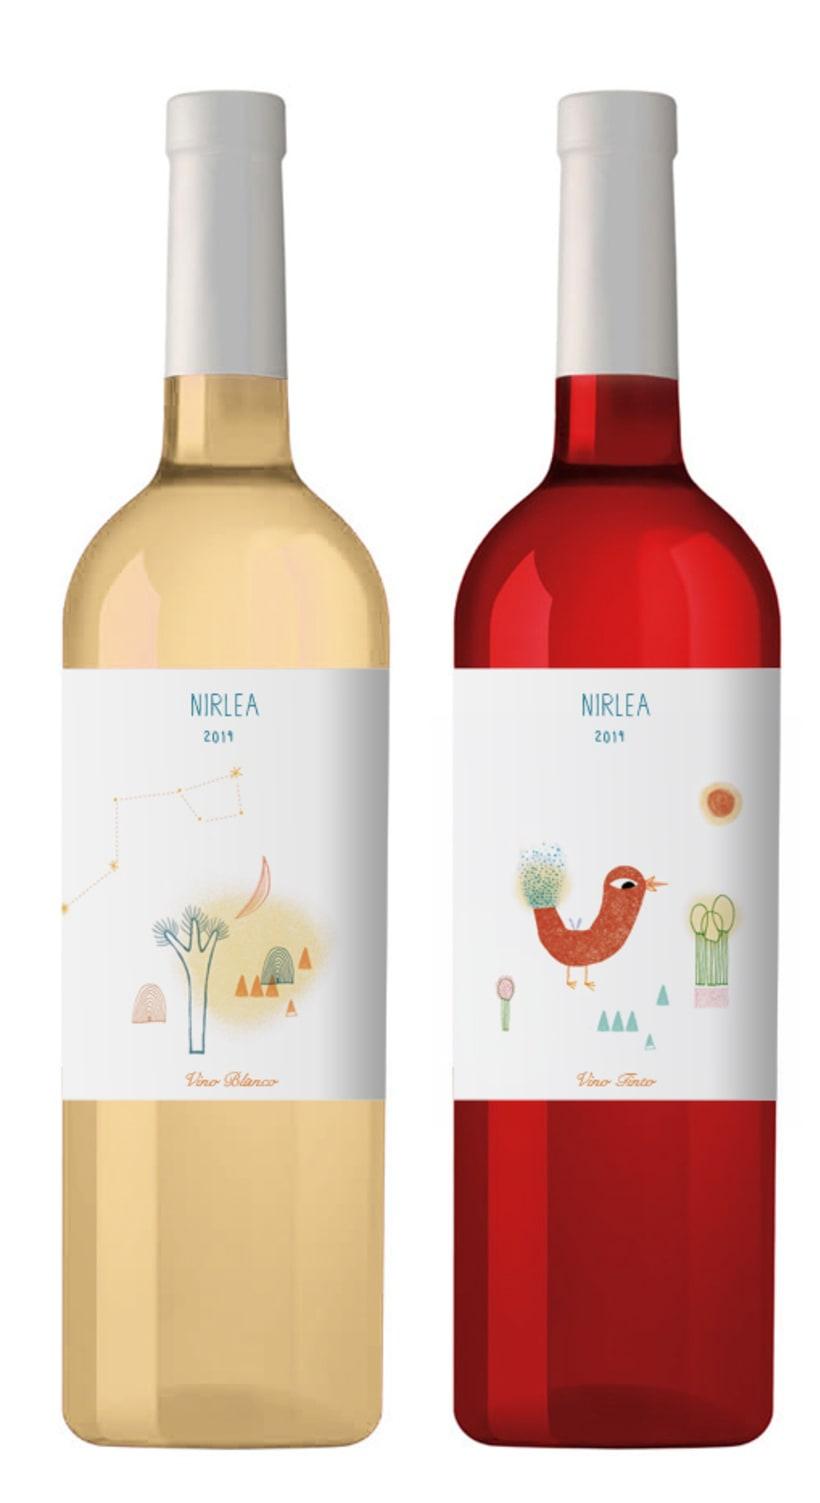 NIRLEA (Wine Label) 2